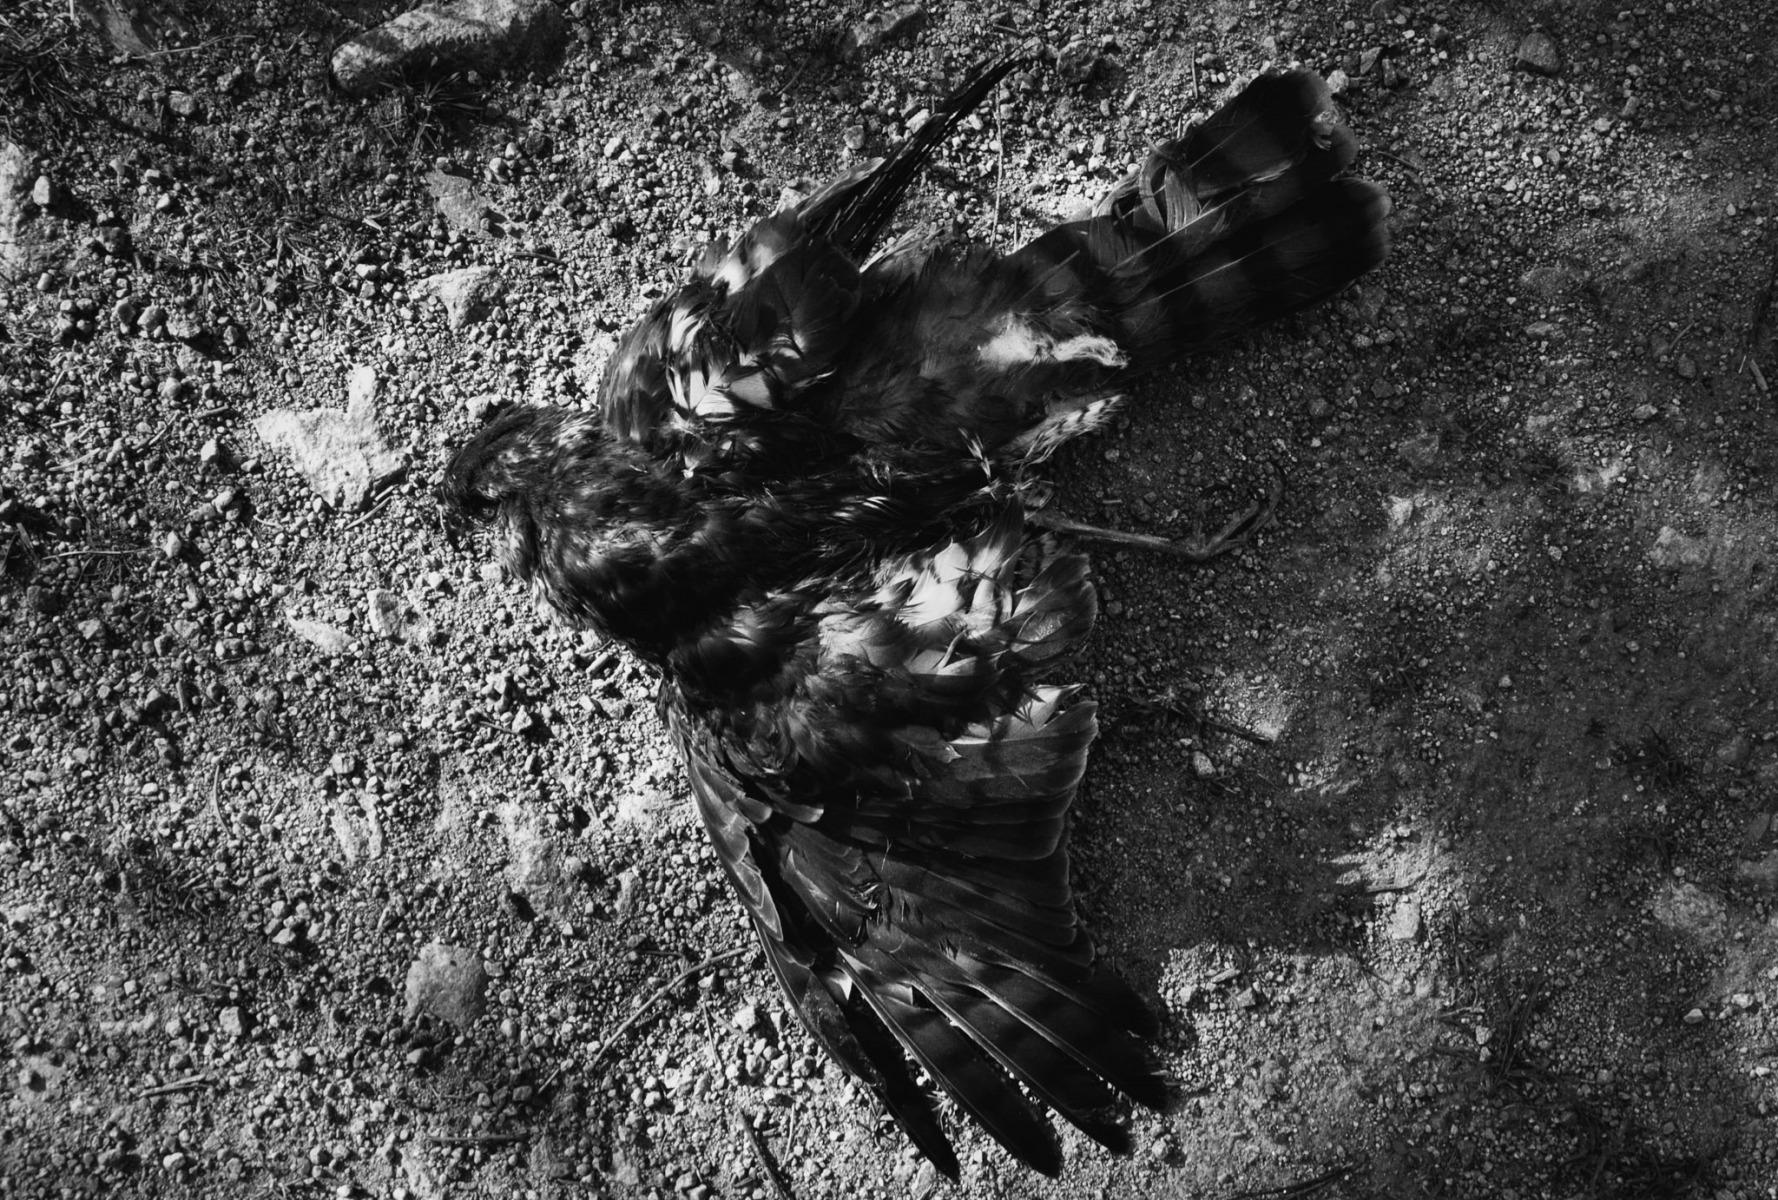 anja-blaksmark-fine-art-sorthvid-død-fugl